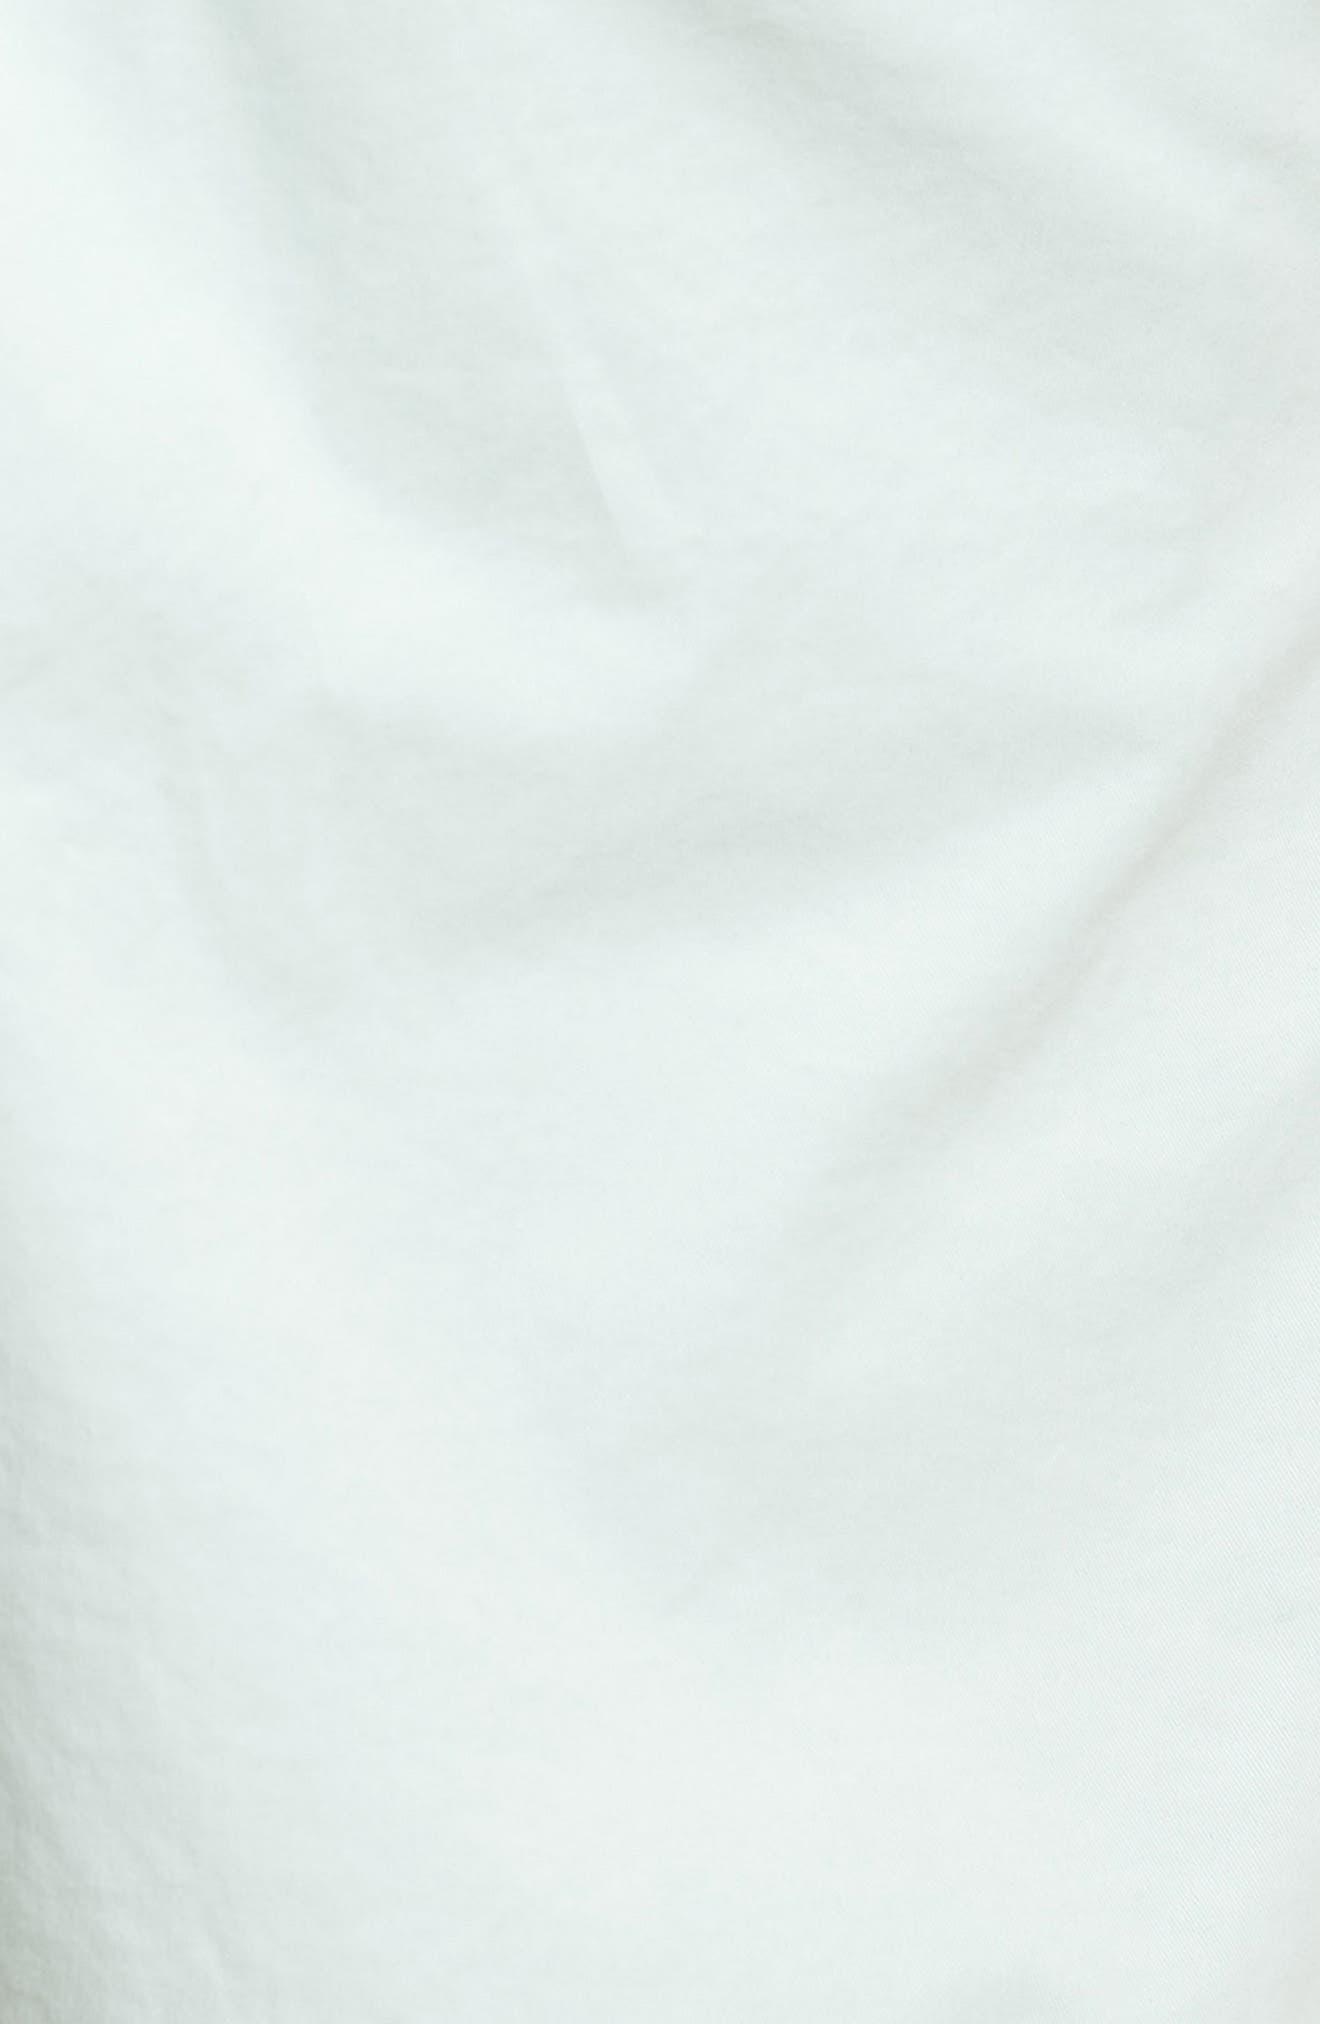 Ballard Slim Fit Stretch Chino 9-Inch Shorts,                             Alternate thumbnail 56, color,